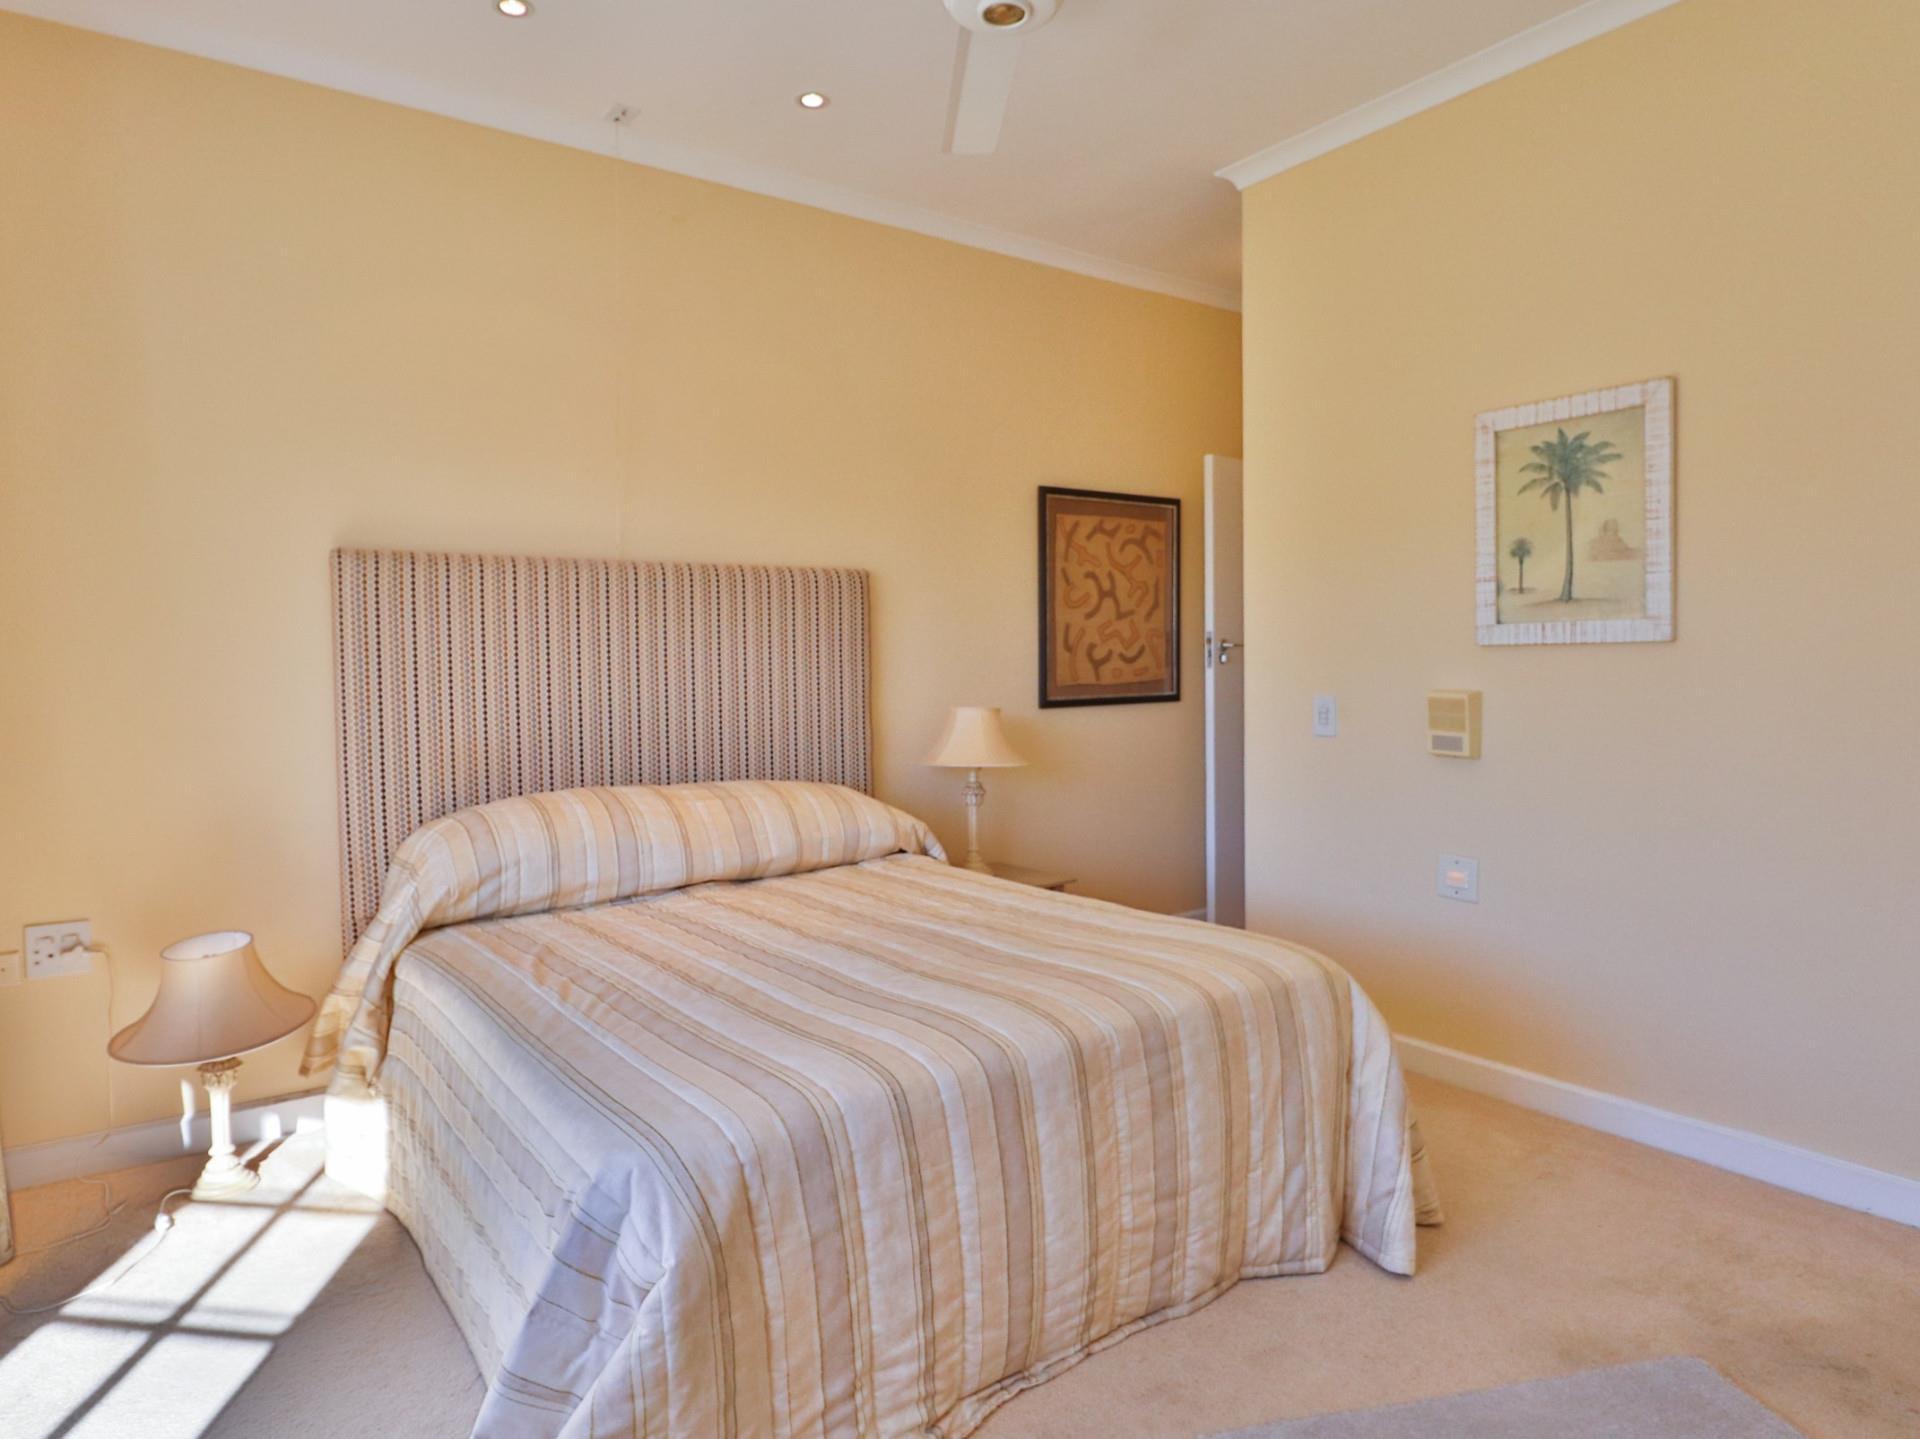 2 Bedroom House For Sale in Belvidere Estate